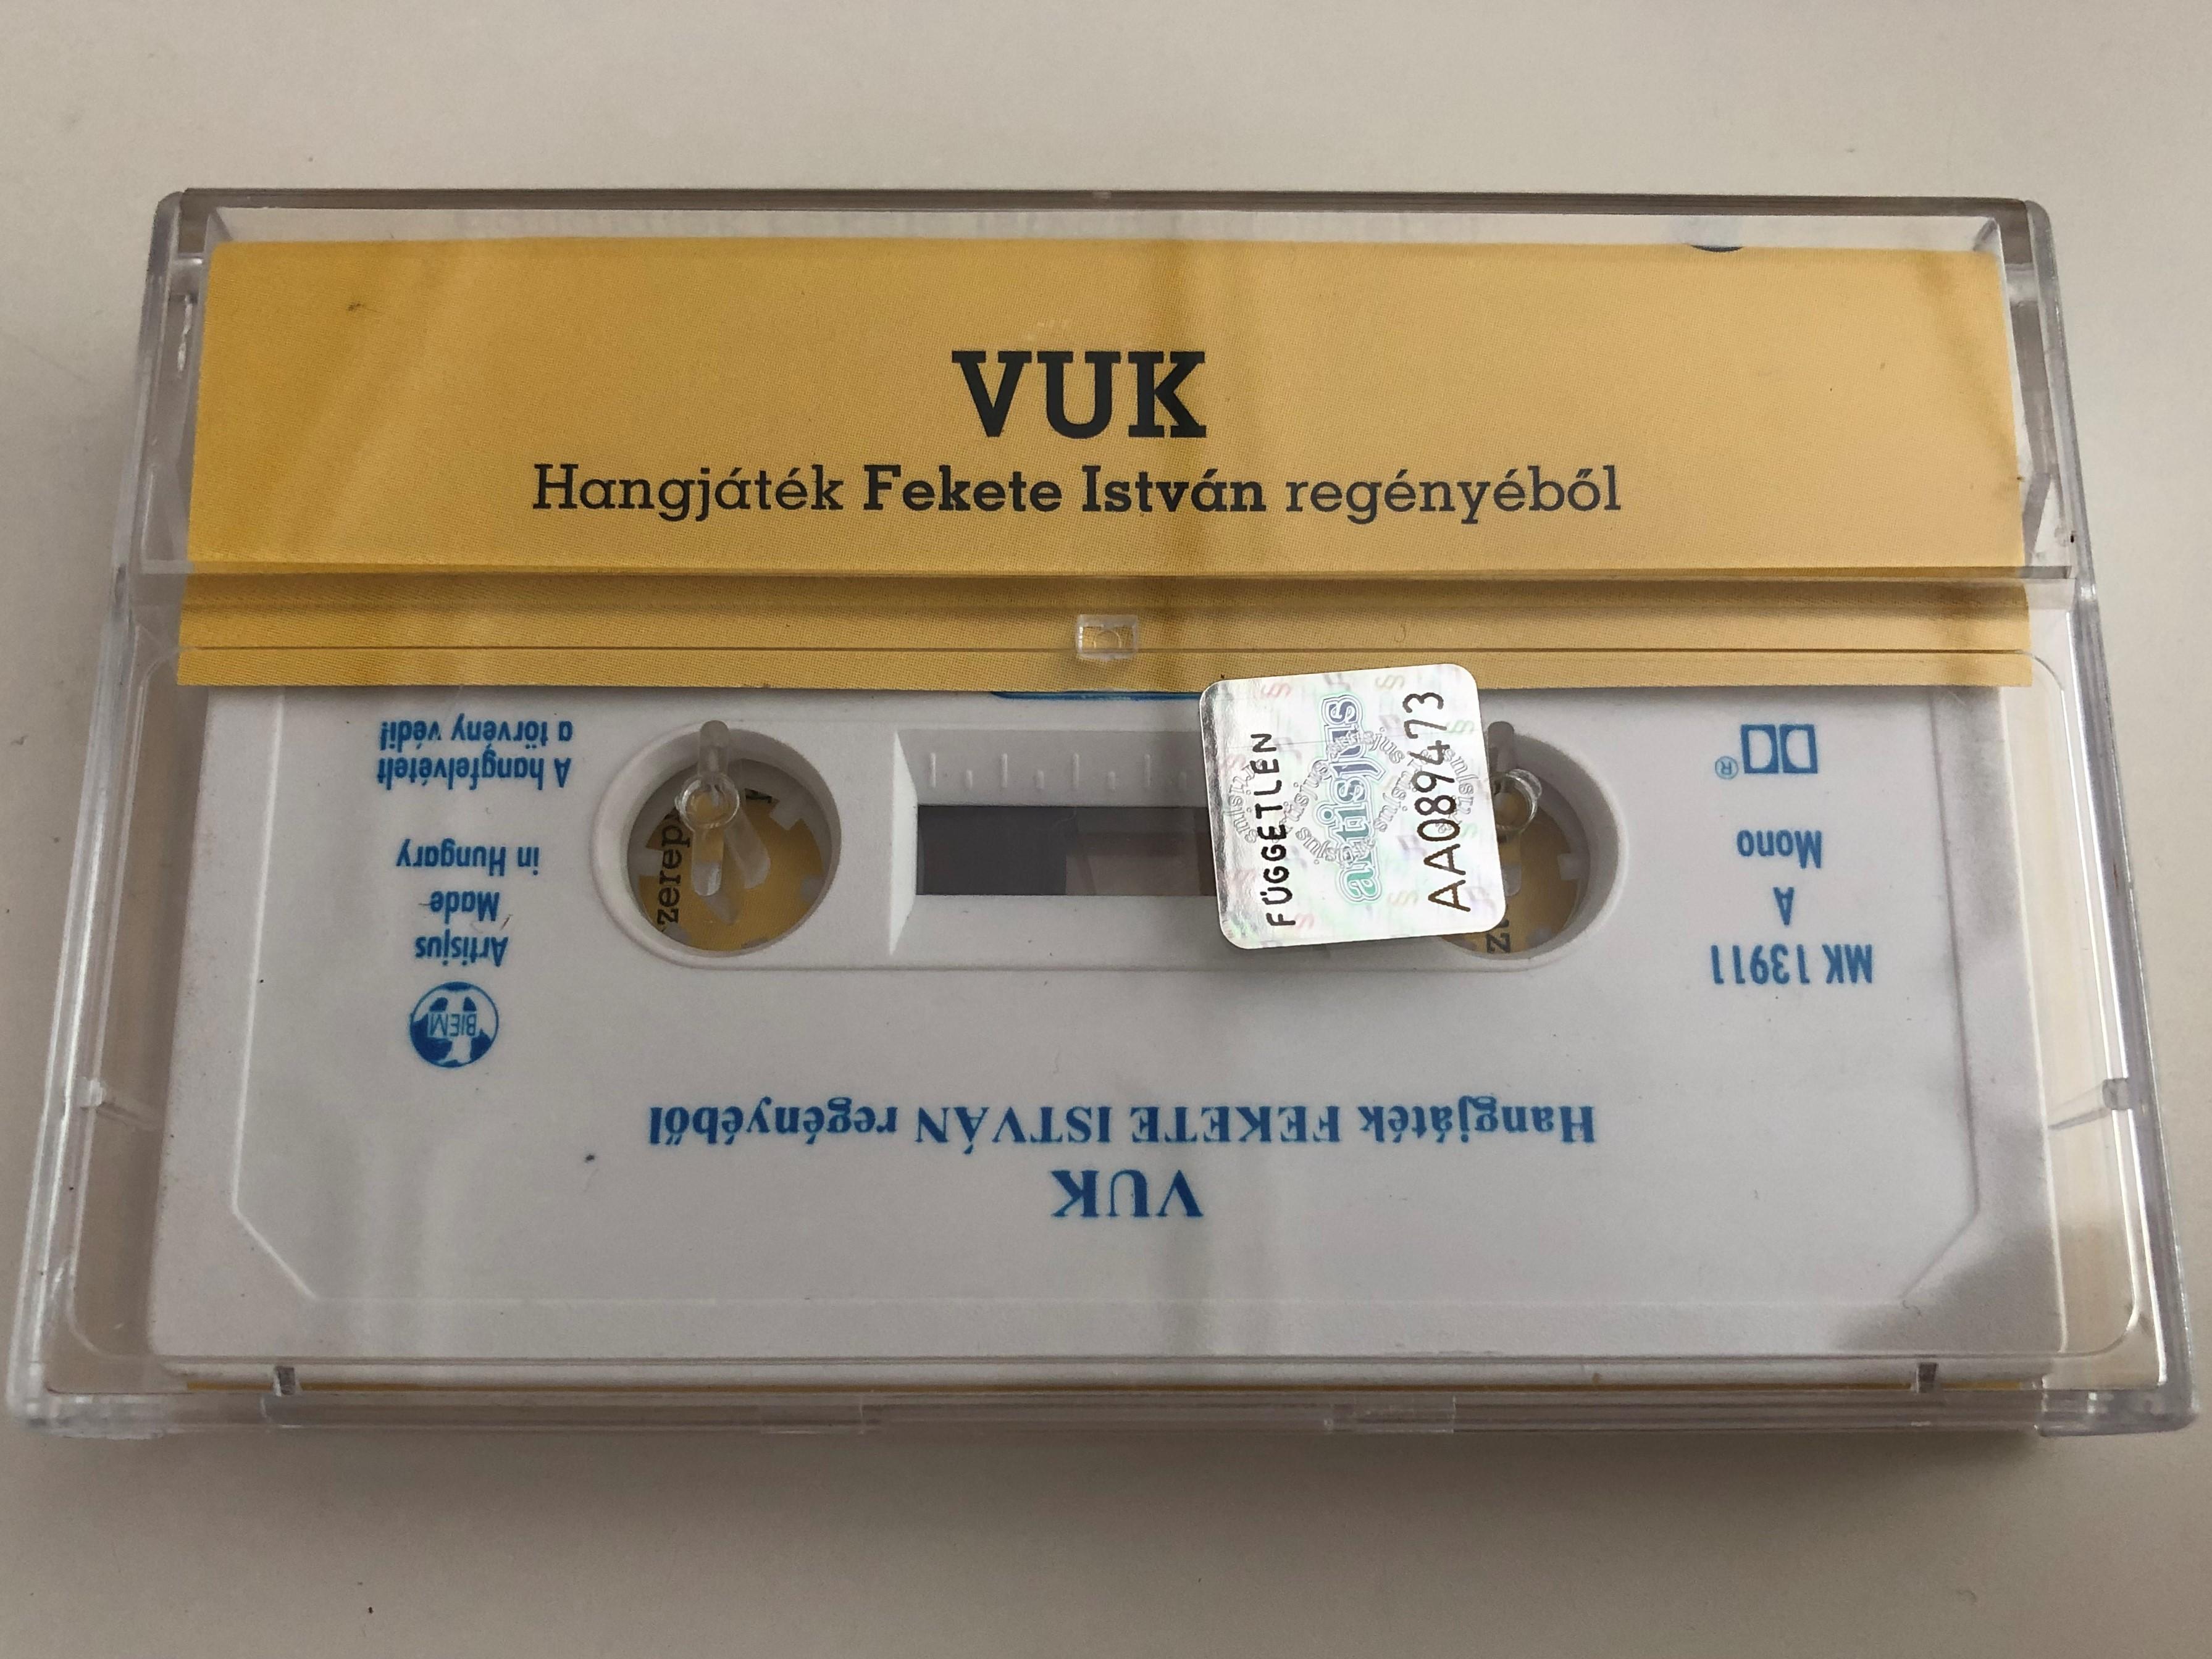 vuk-hangj-t-k-fekete-istv-n-reg-ny-b-l-directed-by-goth-r-p-ter-written-by-szab-va-hungarian-audio-drama-based-on-vuk-the-litte-fox-hungaroton-classic-audio-casette-1982-mk-13911-3-.jpg